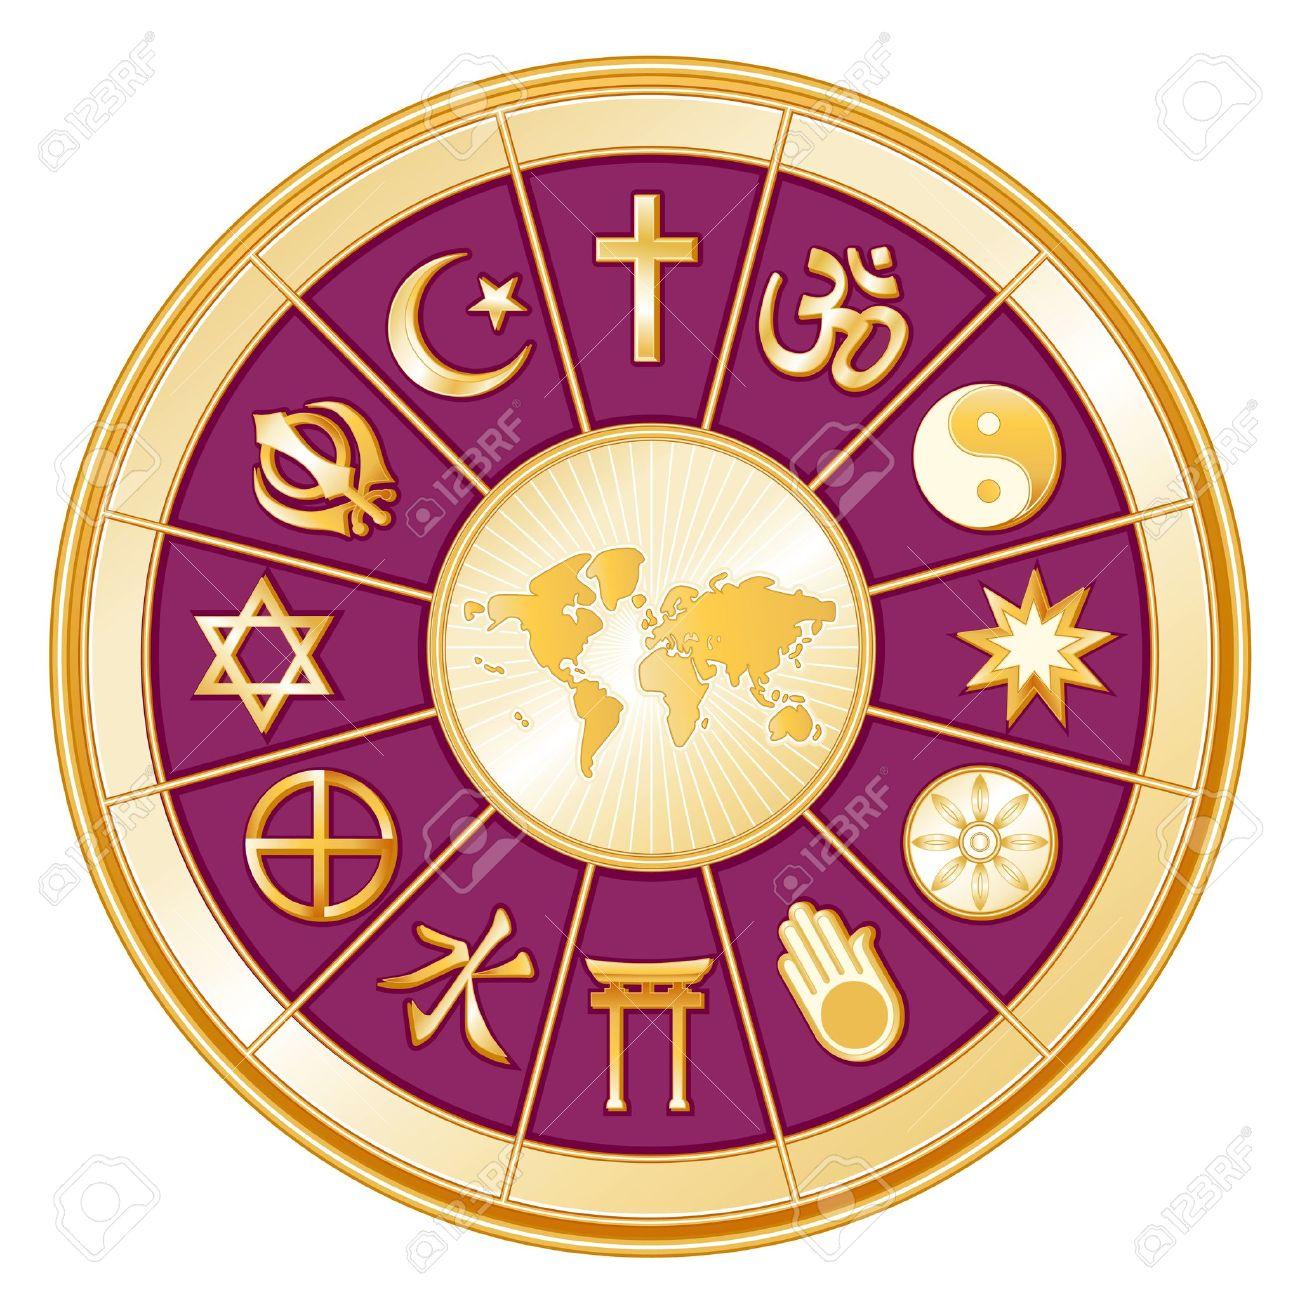 World Religions surrounding earth map  Islam, Christianity, Hinduism, Taoism, Baha i, Buddhism, Jain, Shinto, Confucianism, Native Spirituality, Judaism, Sikh Stock Vector - 14202169